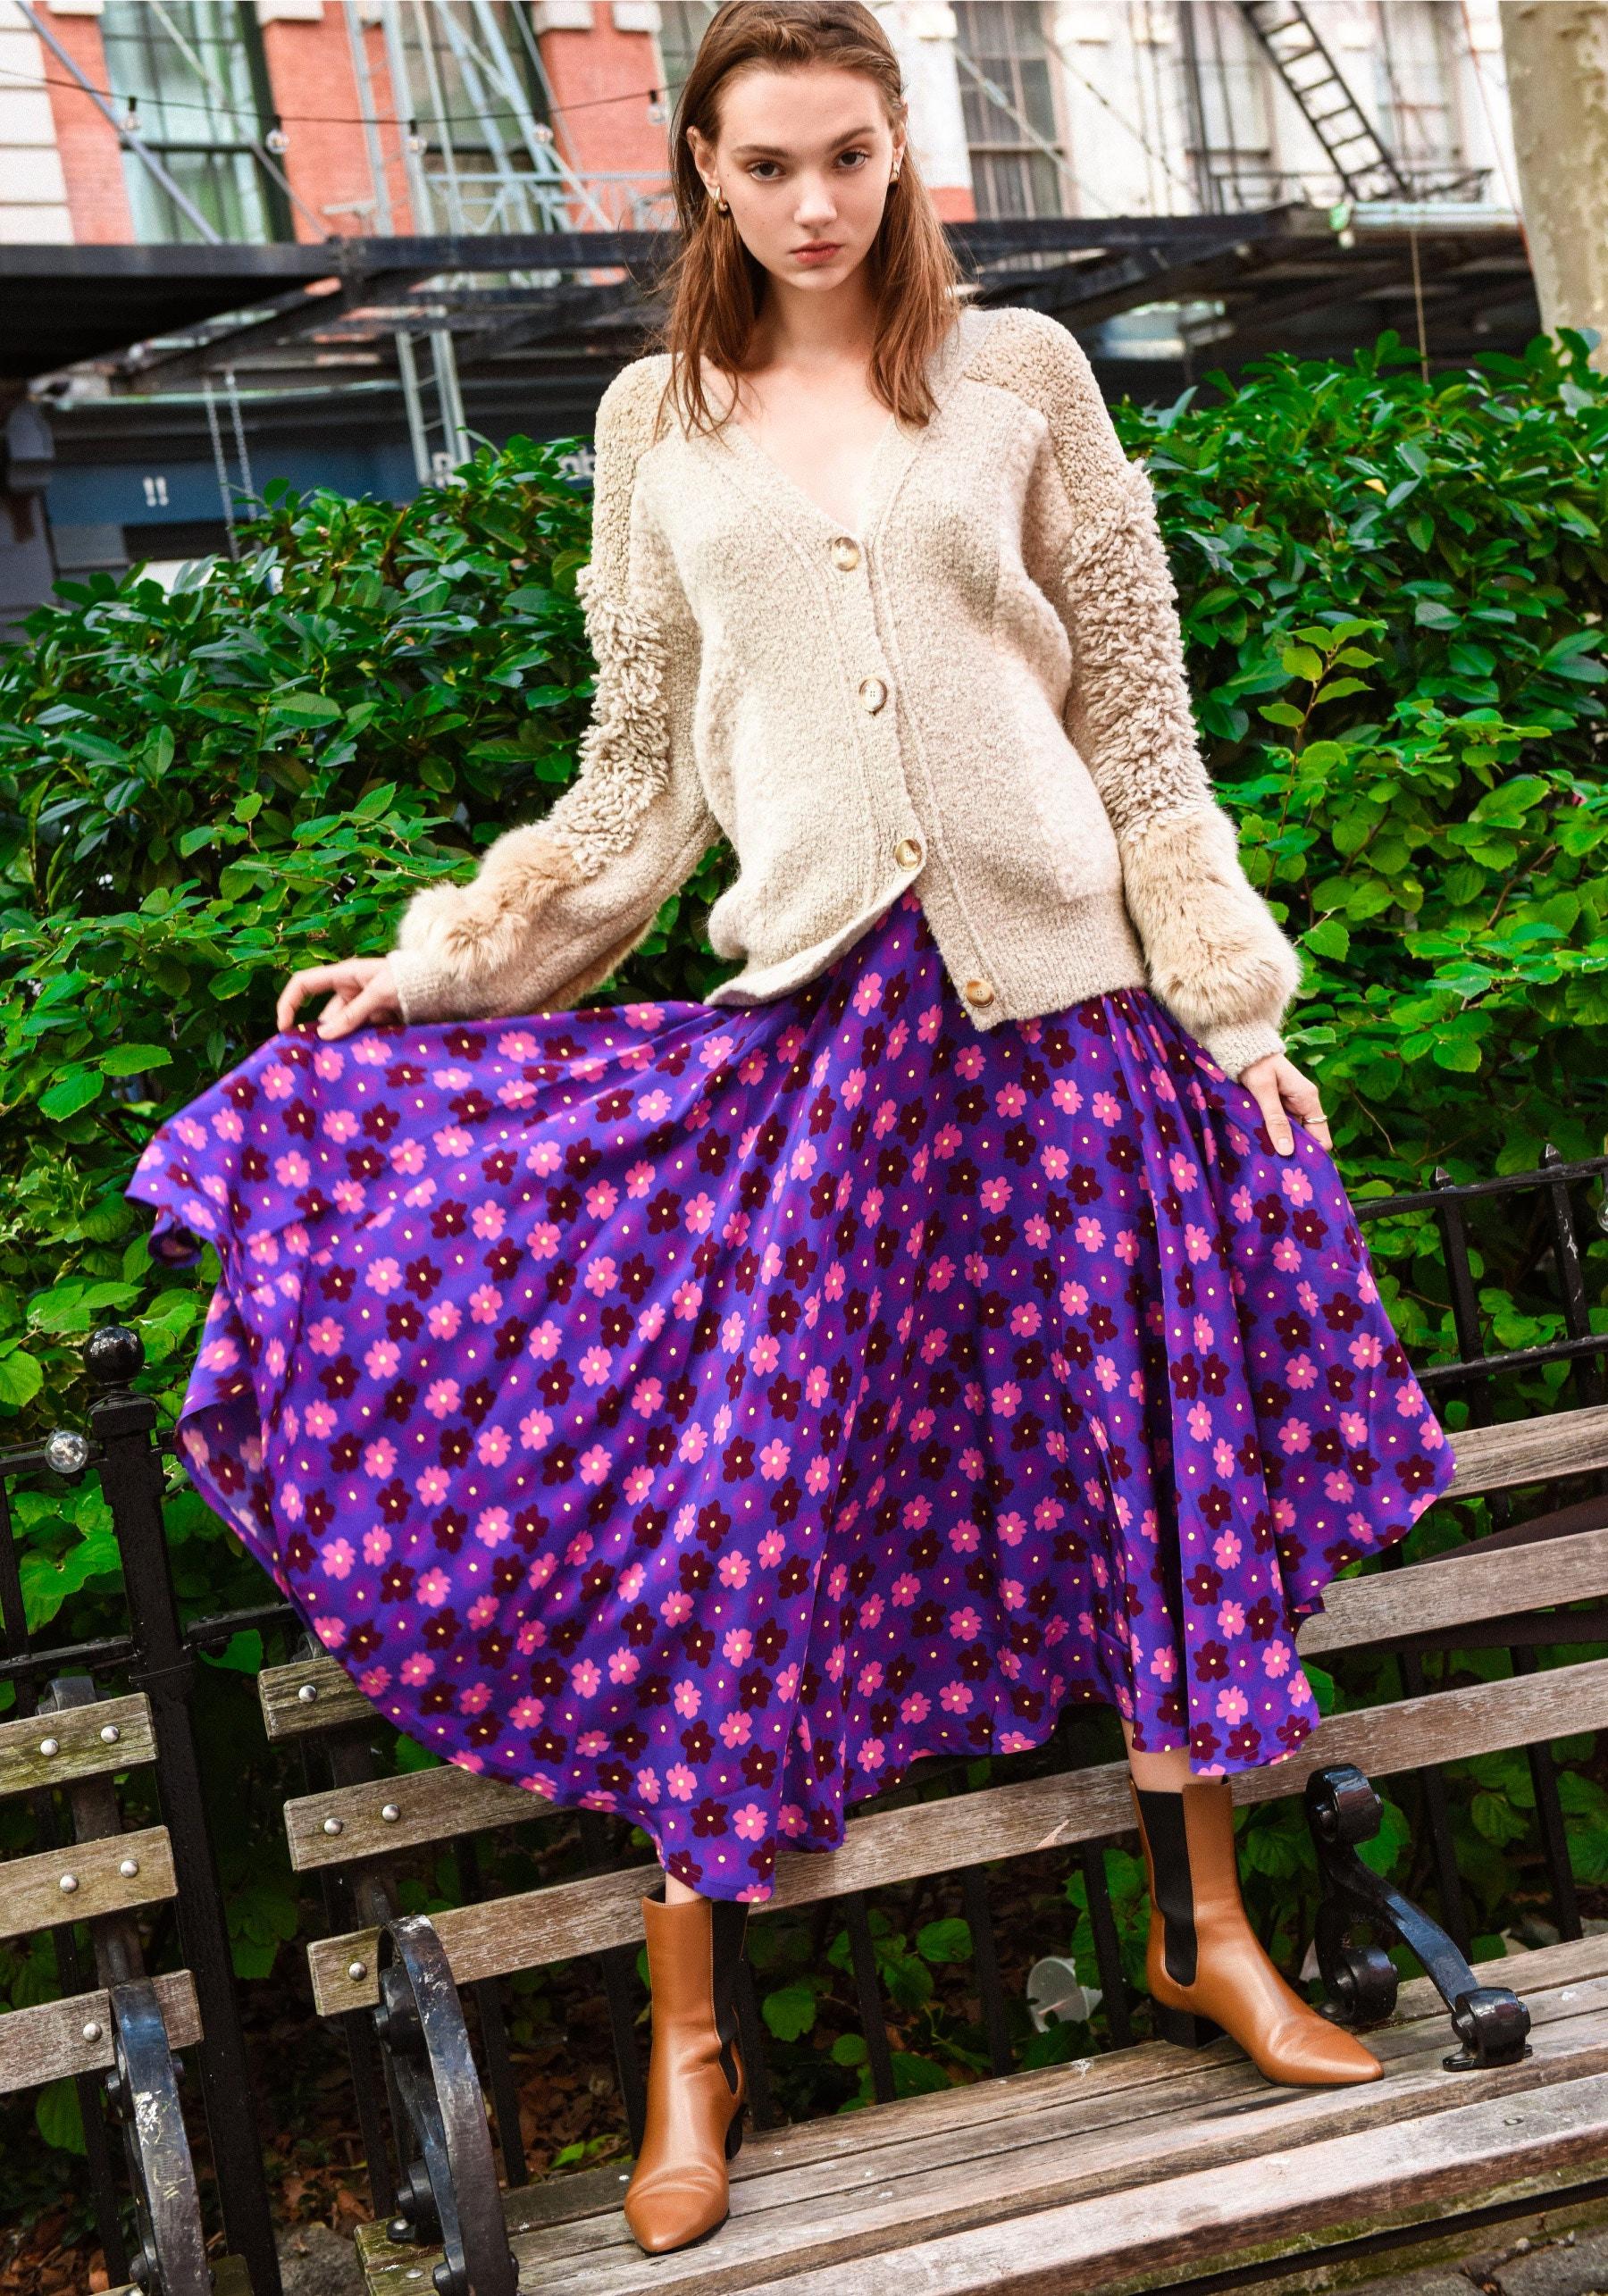 STELLA McCARTNEY Furry Fringed Cardigan – LHD French Riviera Skirt